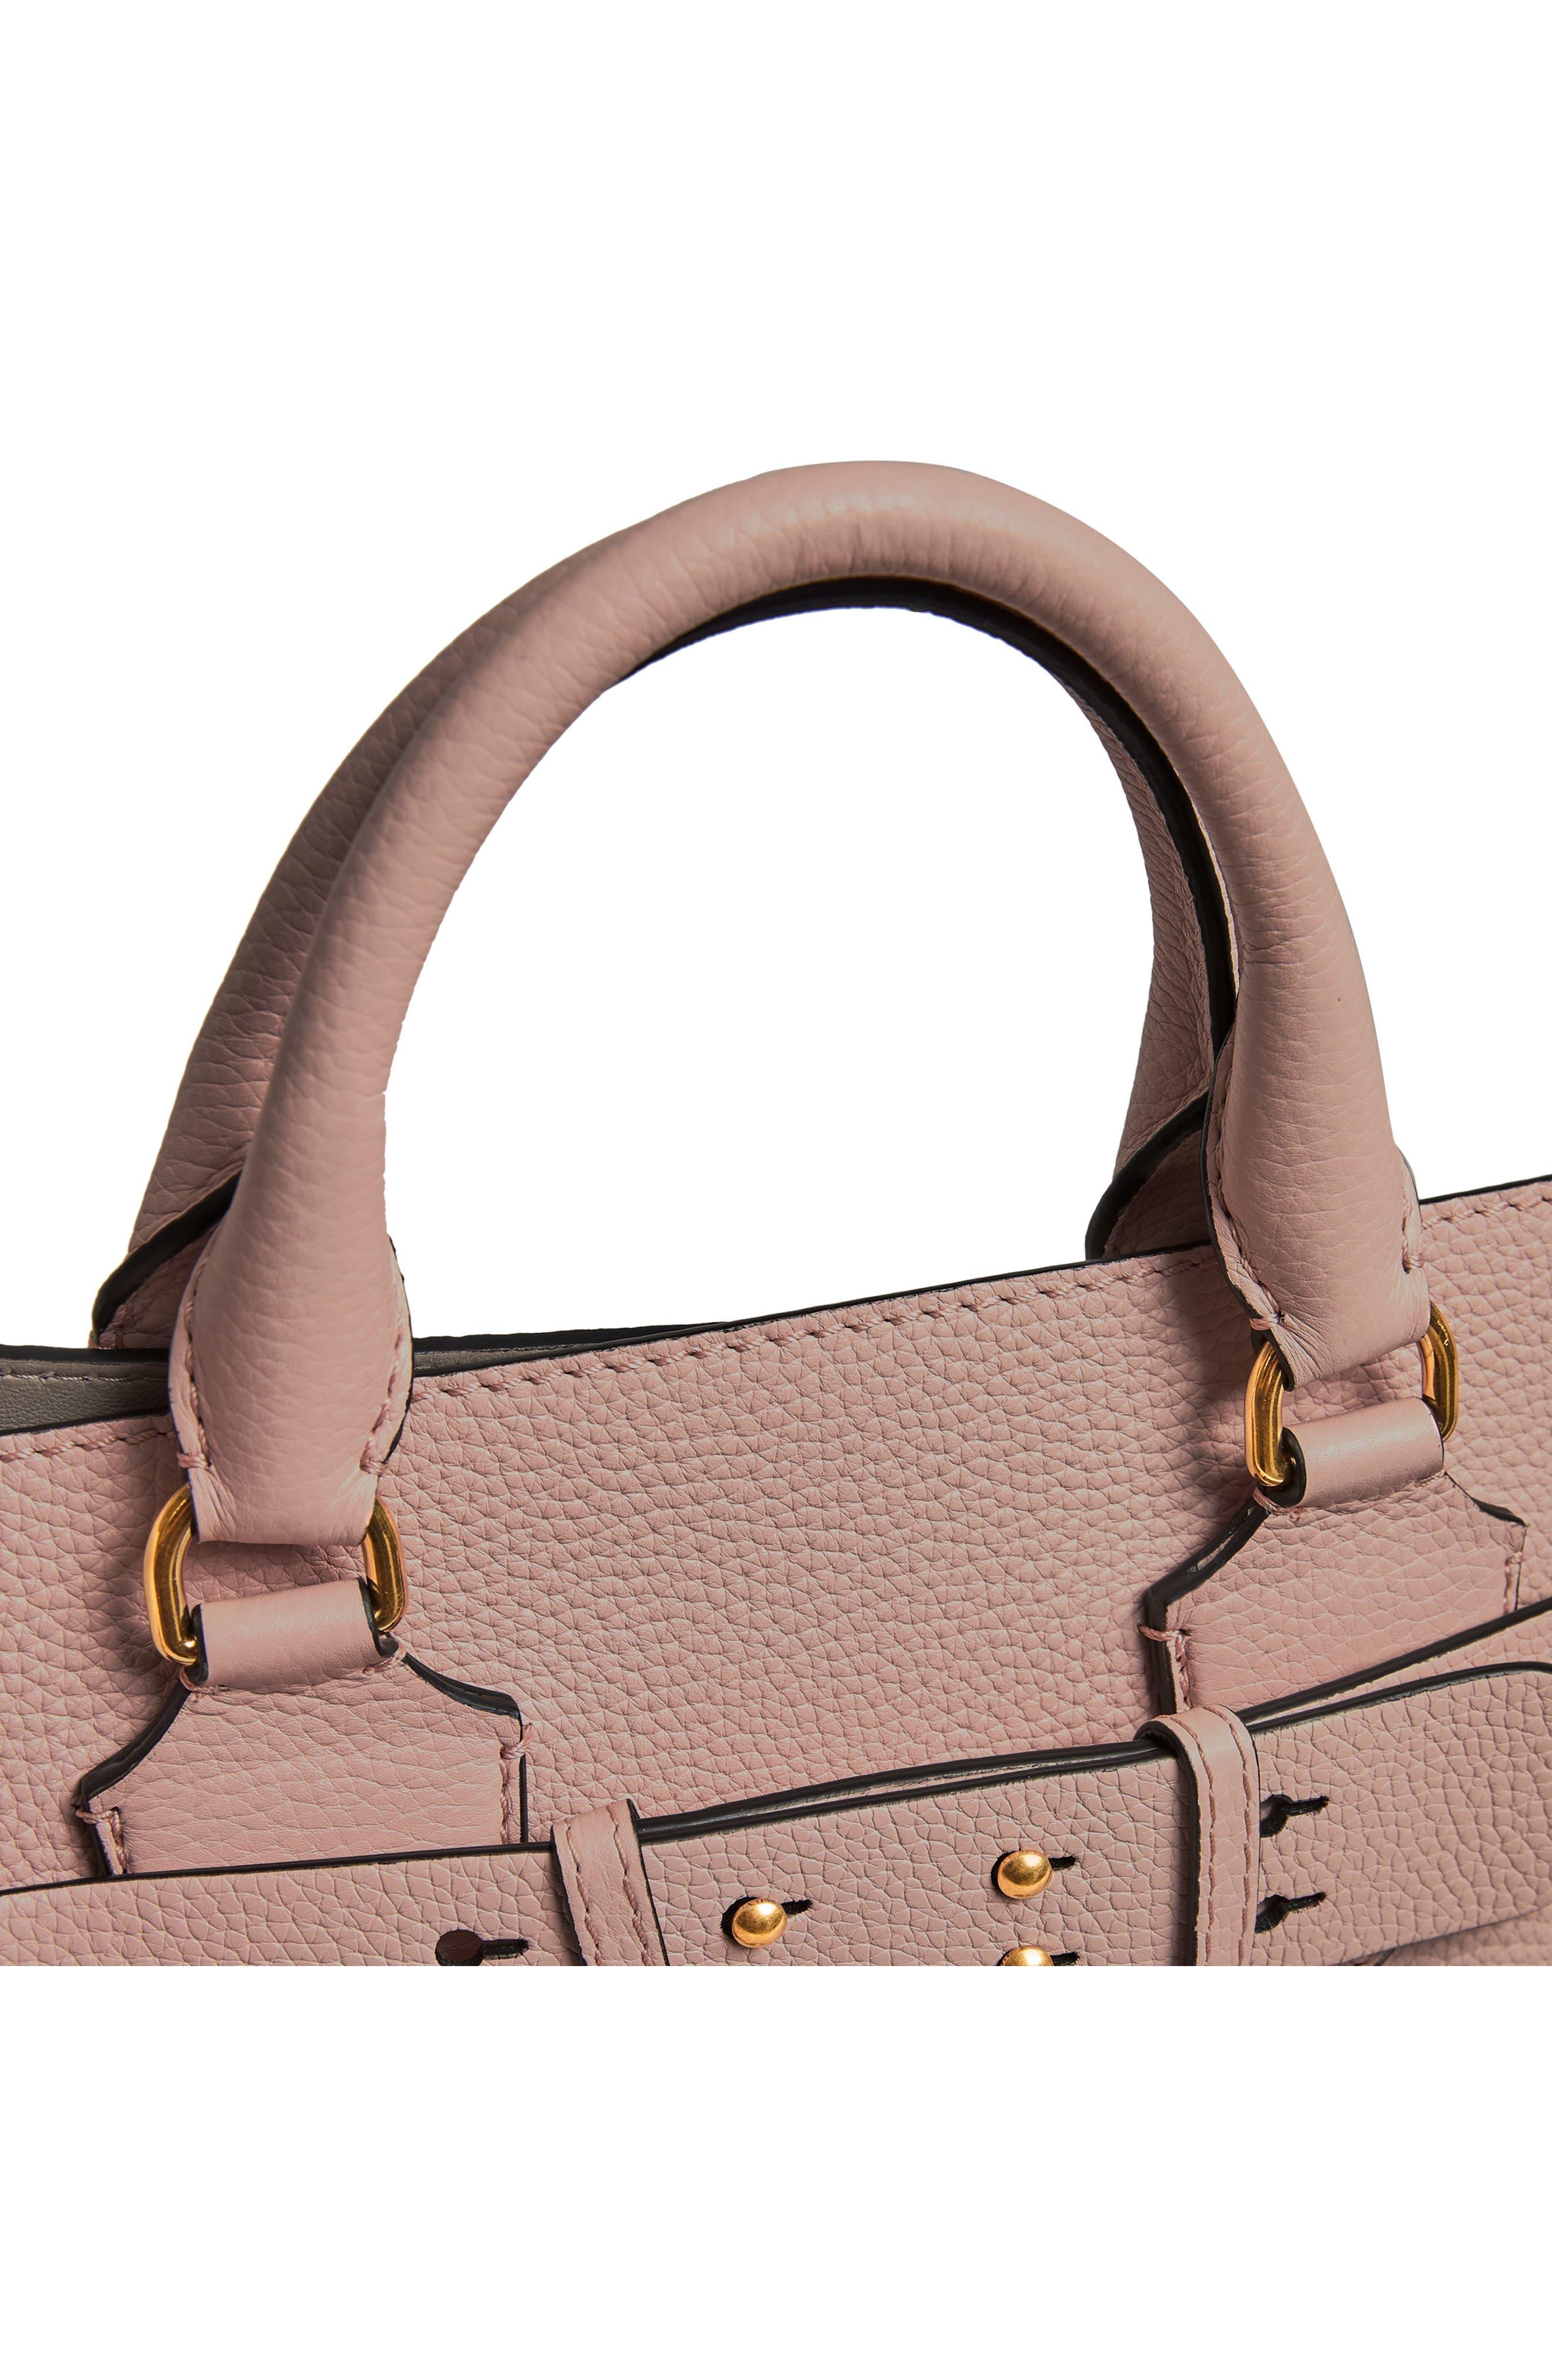 Medium Belt Bag Leather Tote,                             Alternate thumbnail 8, color,                             PALE ASH ROSE